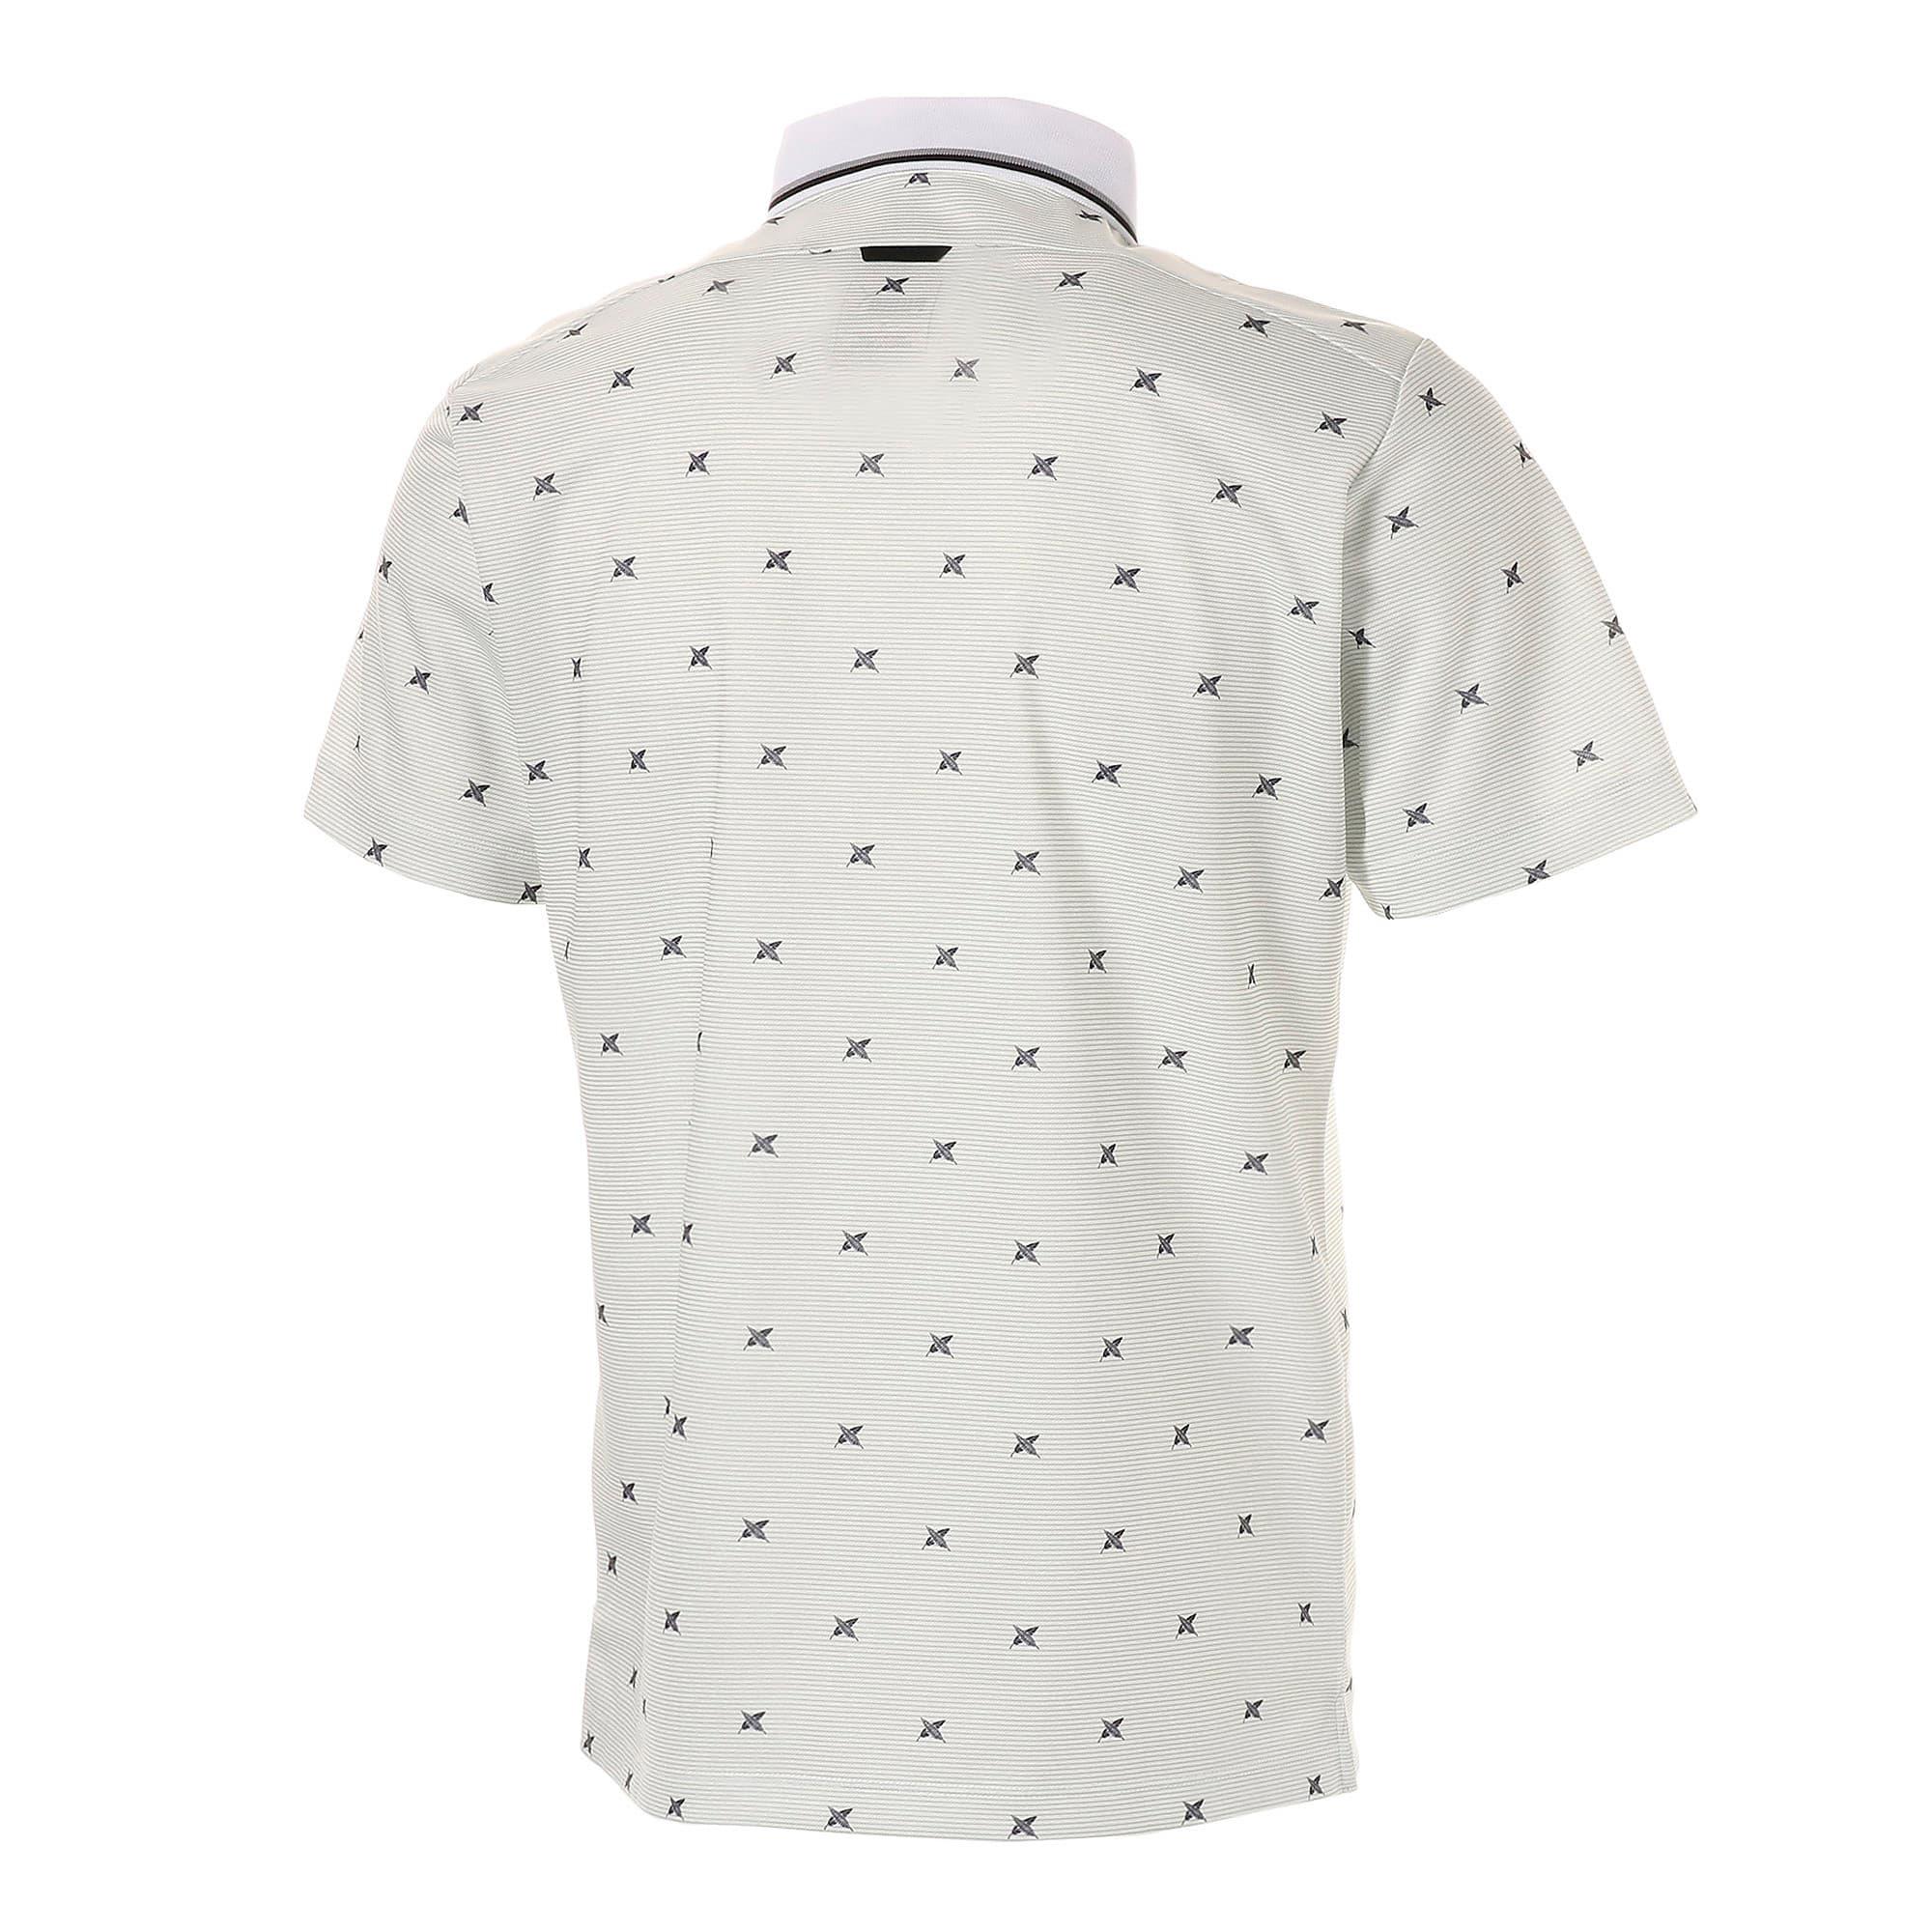 Thumbnail 3 of ゴルフ フェザーフュージョン SSポロシャツ 半袖, Bright White, medium-JPN